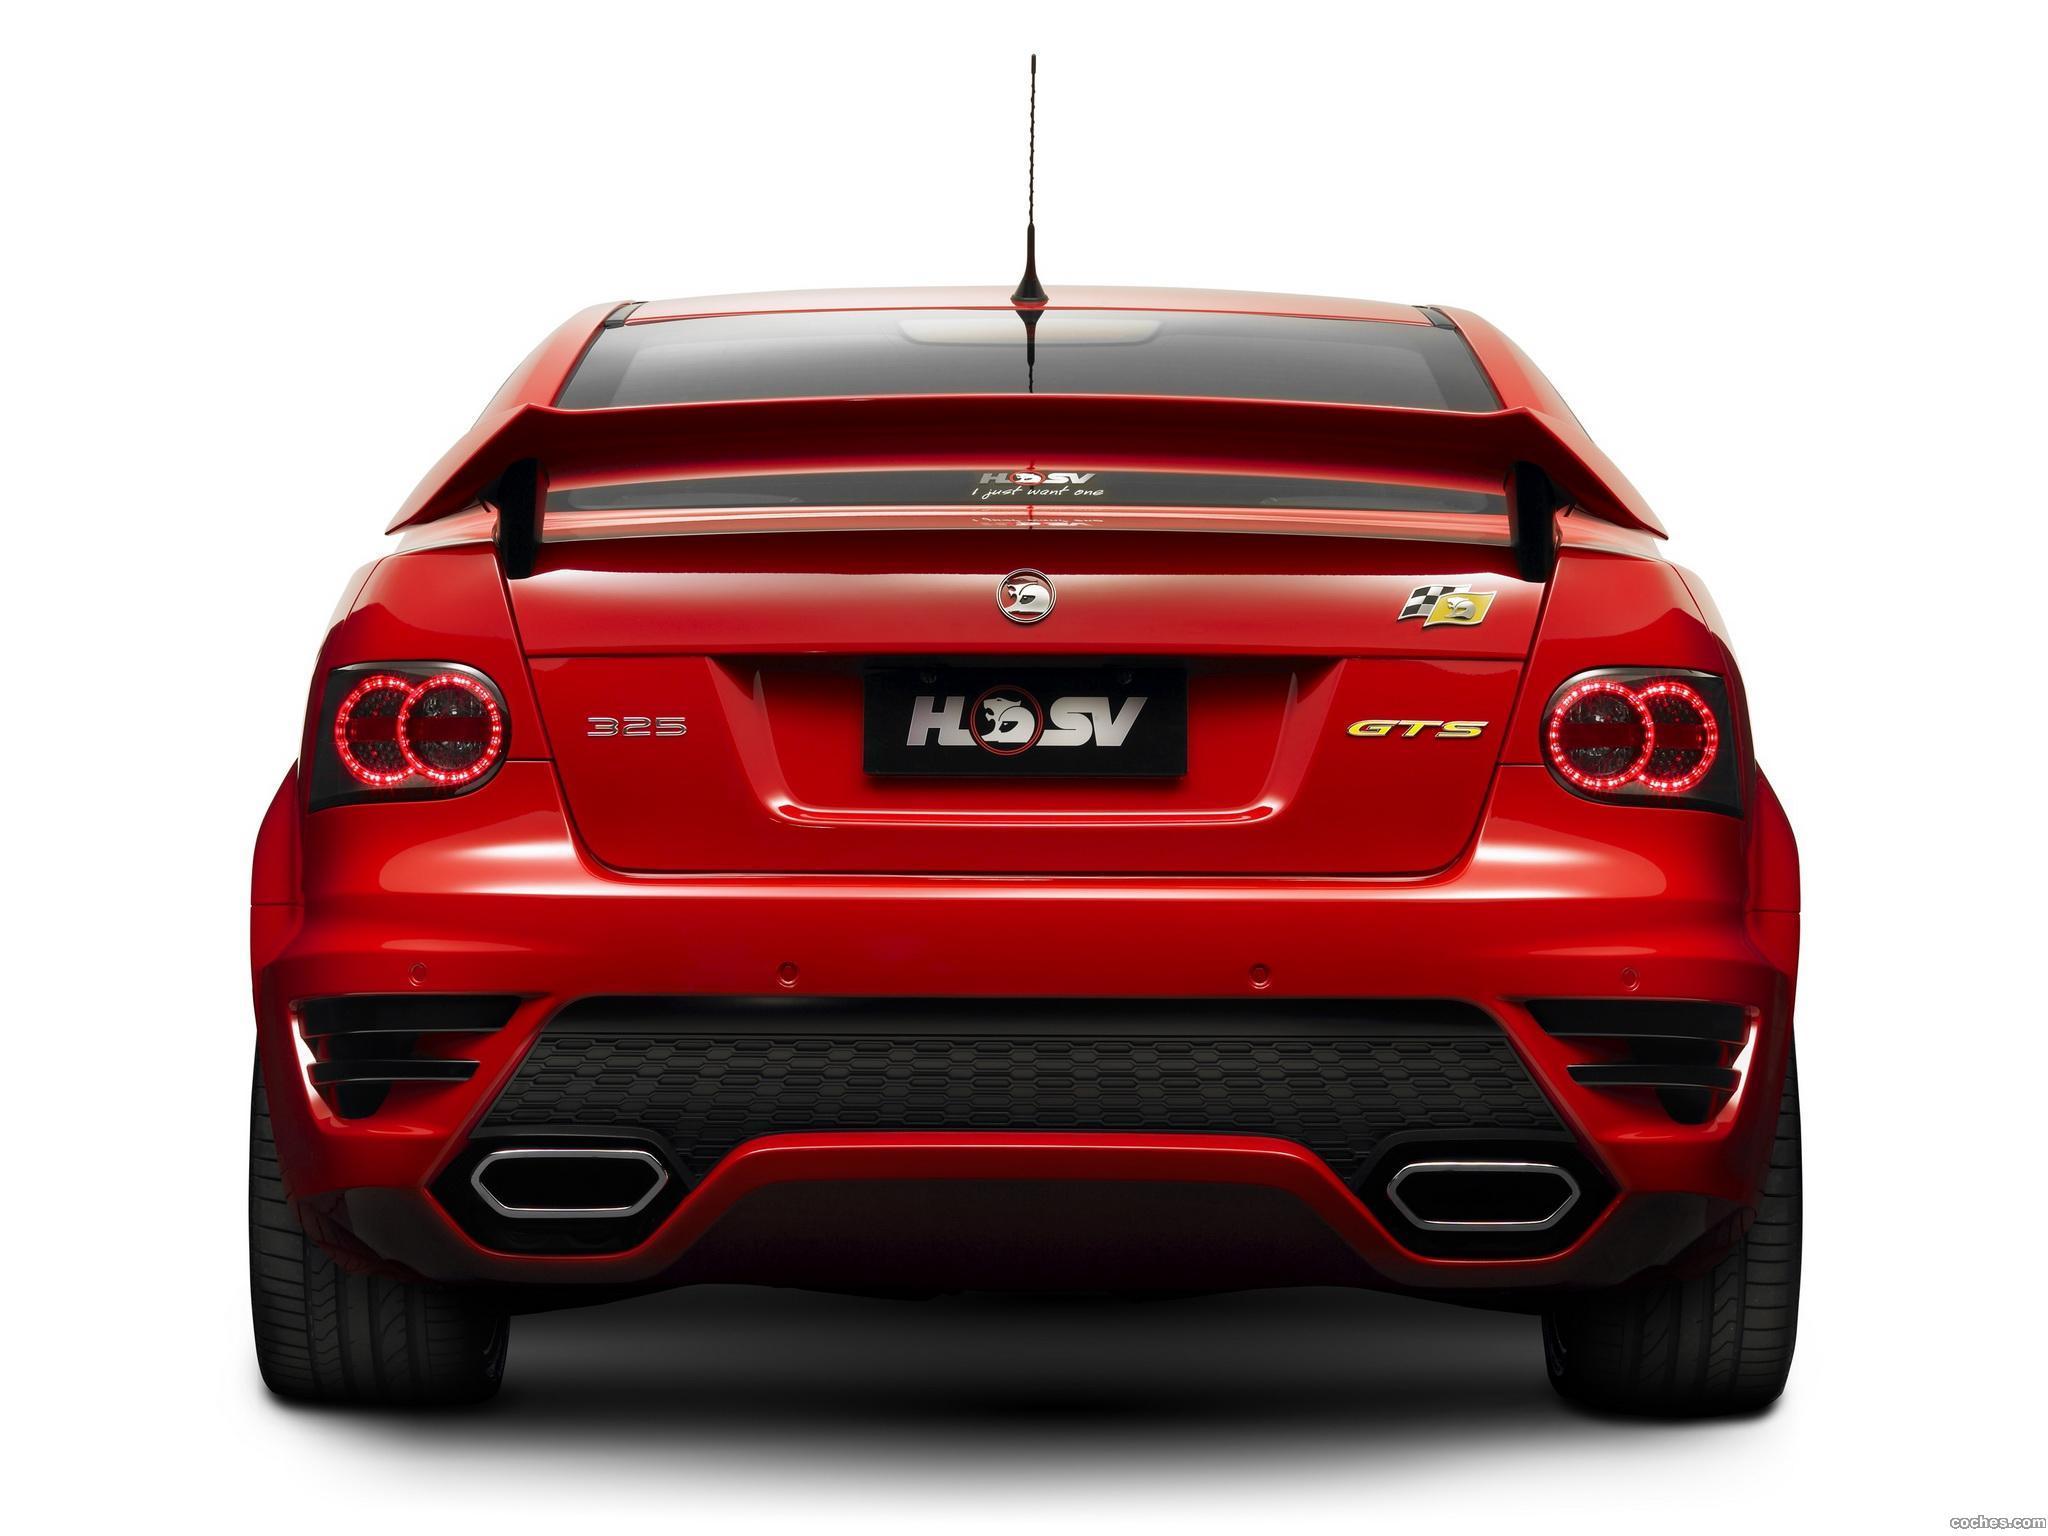 Foto 4 de Holden HSV GTS 2010